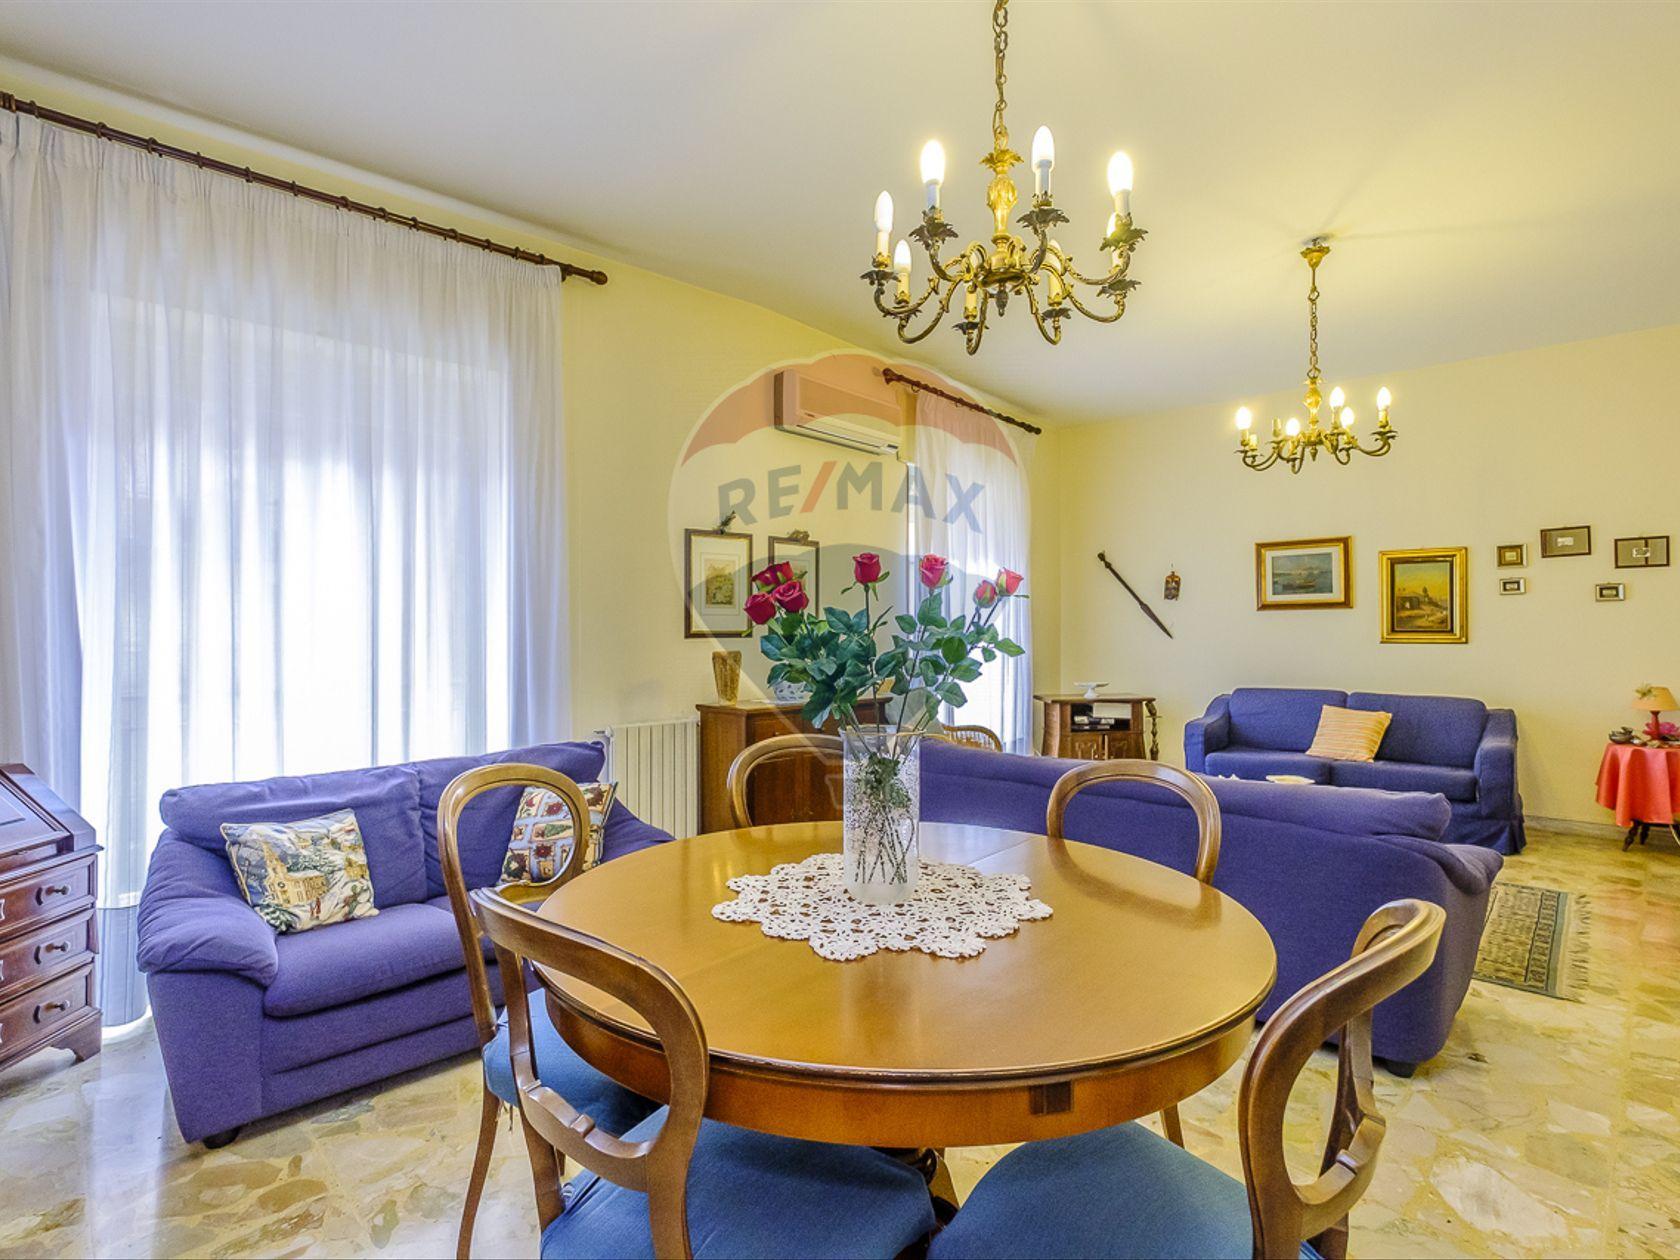 Appartamento Siracusa- Scala Greca S. Panagia Teracati Zecchino, Siracusa, SR Vendita